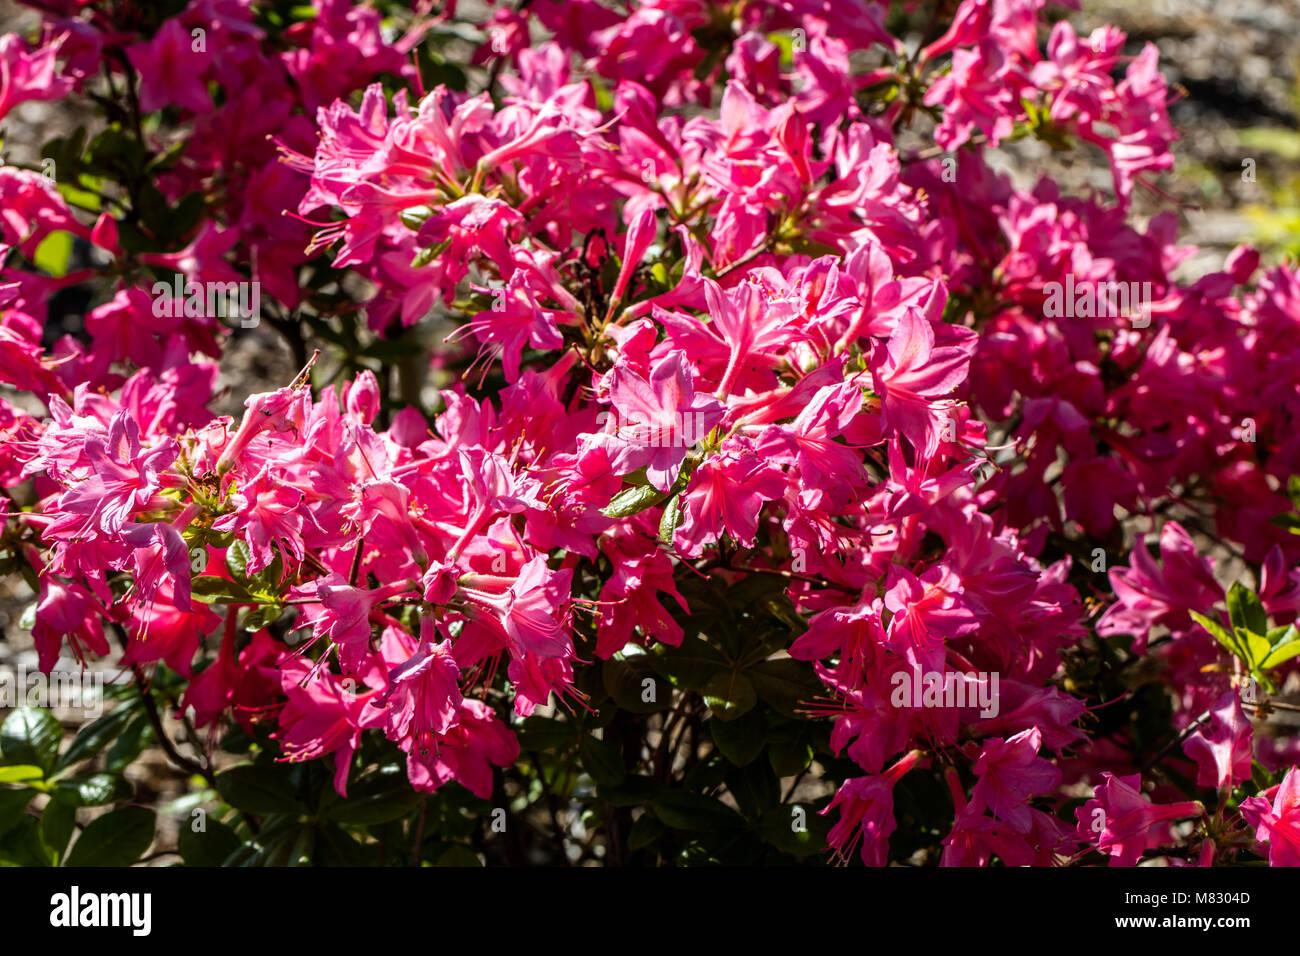 'Jolie Madame' Viscosa azalea, Viscosa gruppen (Rhododendron hybrida) - Stock Image